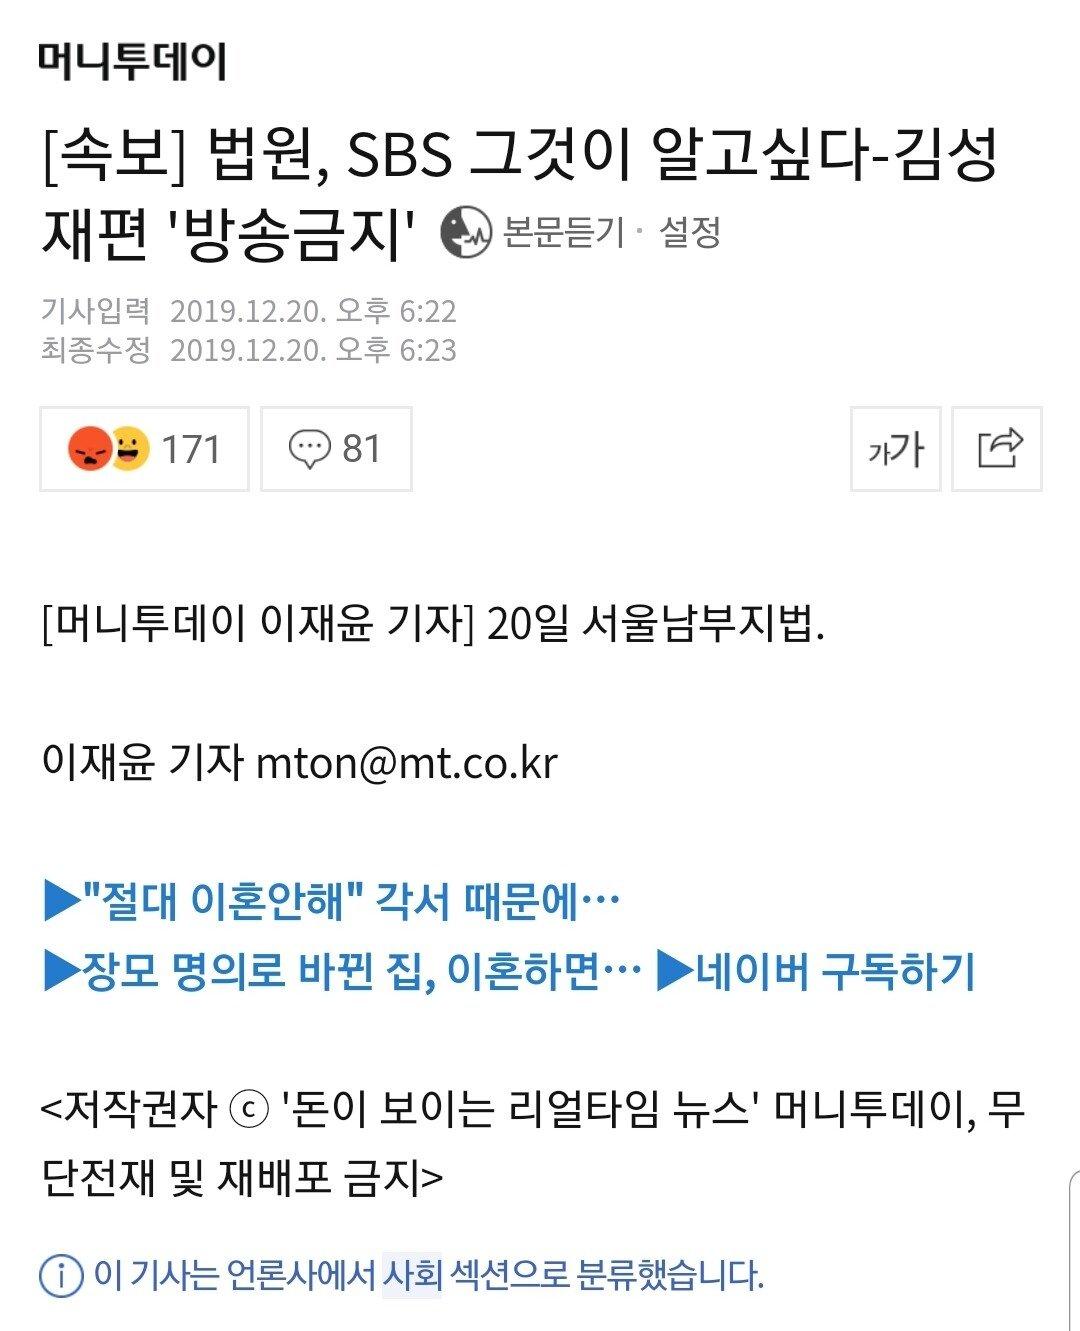 Screenshot_20191220-183130_Samsung Internet.jpg [속보] 법원, SBS 그것이 알고싶다-김성재편